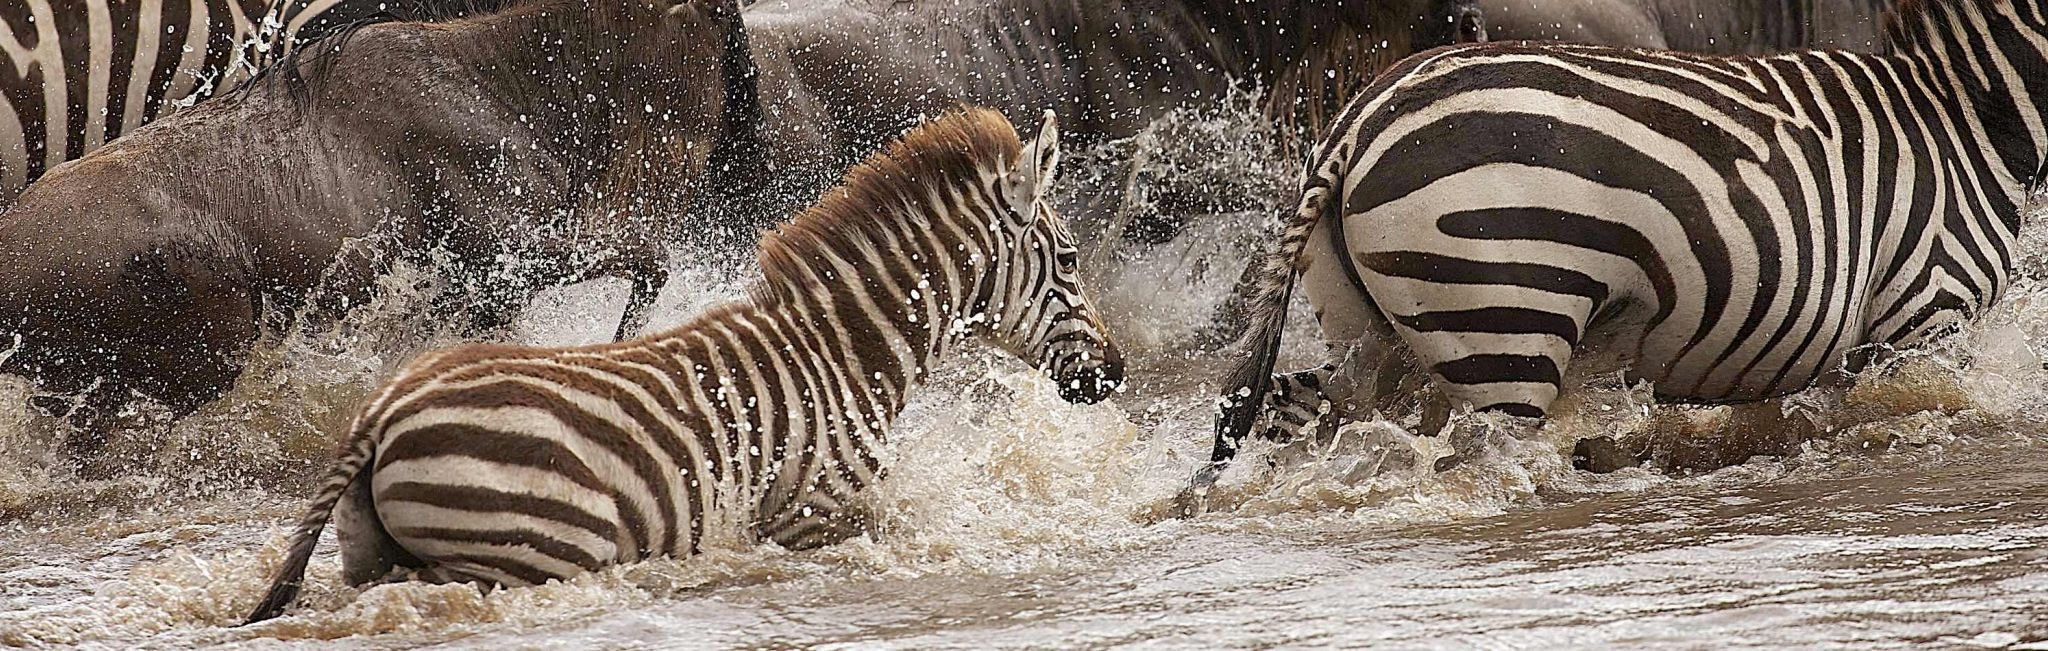 African Safari Tours | Best Safaris & Vacations 2019-2020